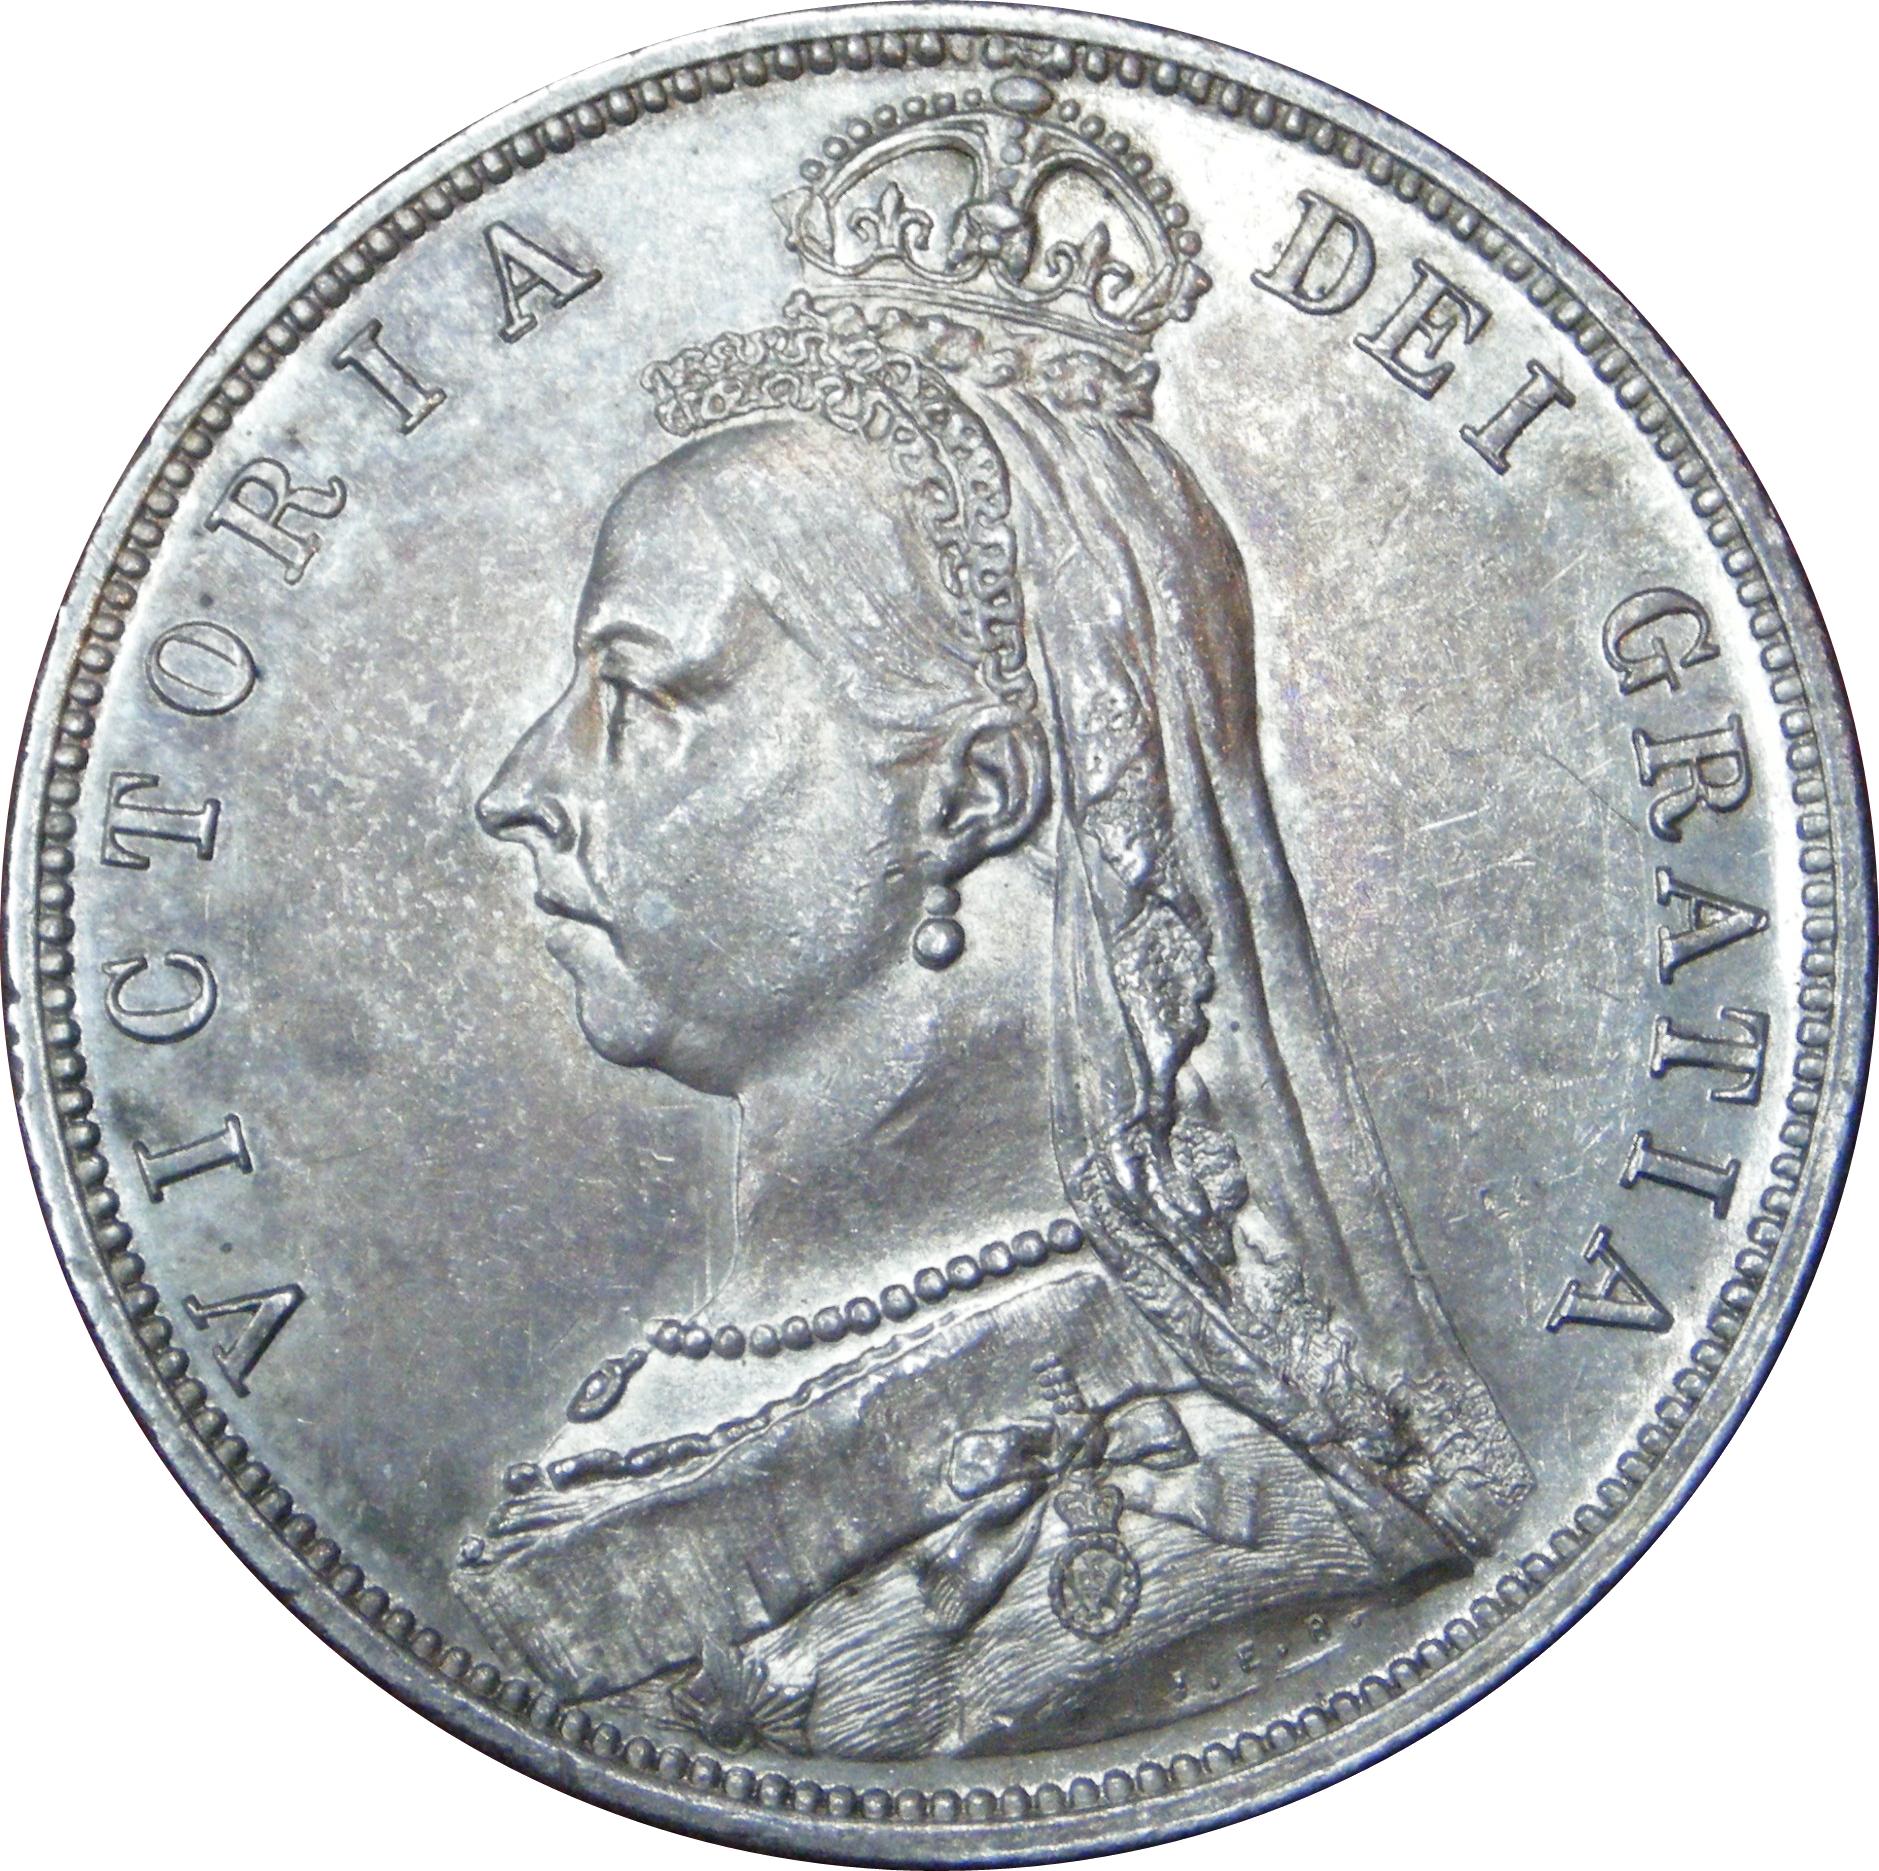 1887 QV half crown & 1935 GV Florin – Numista